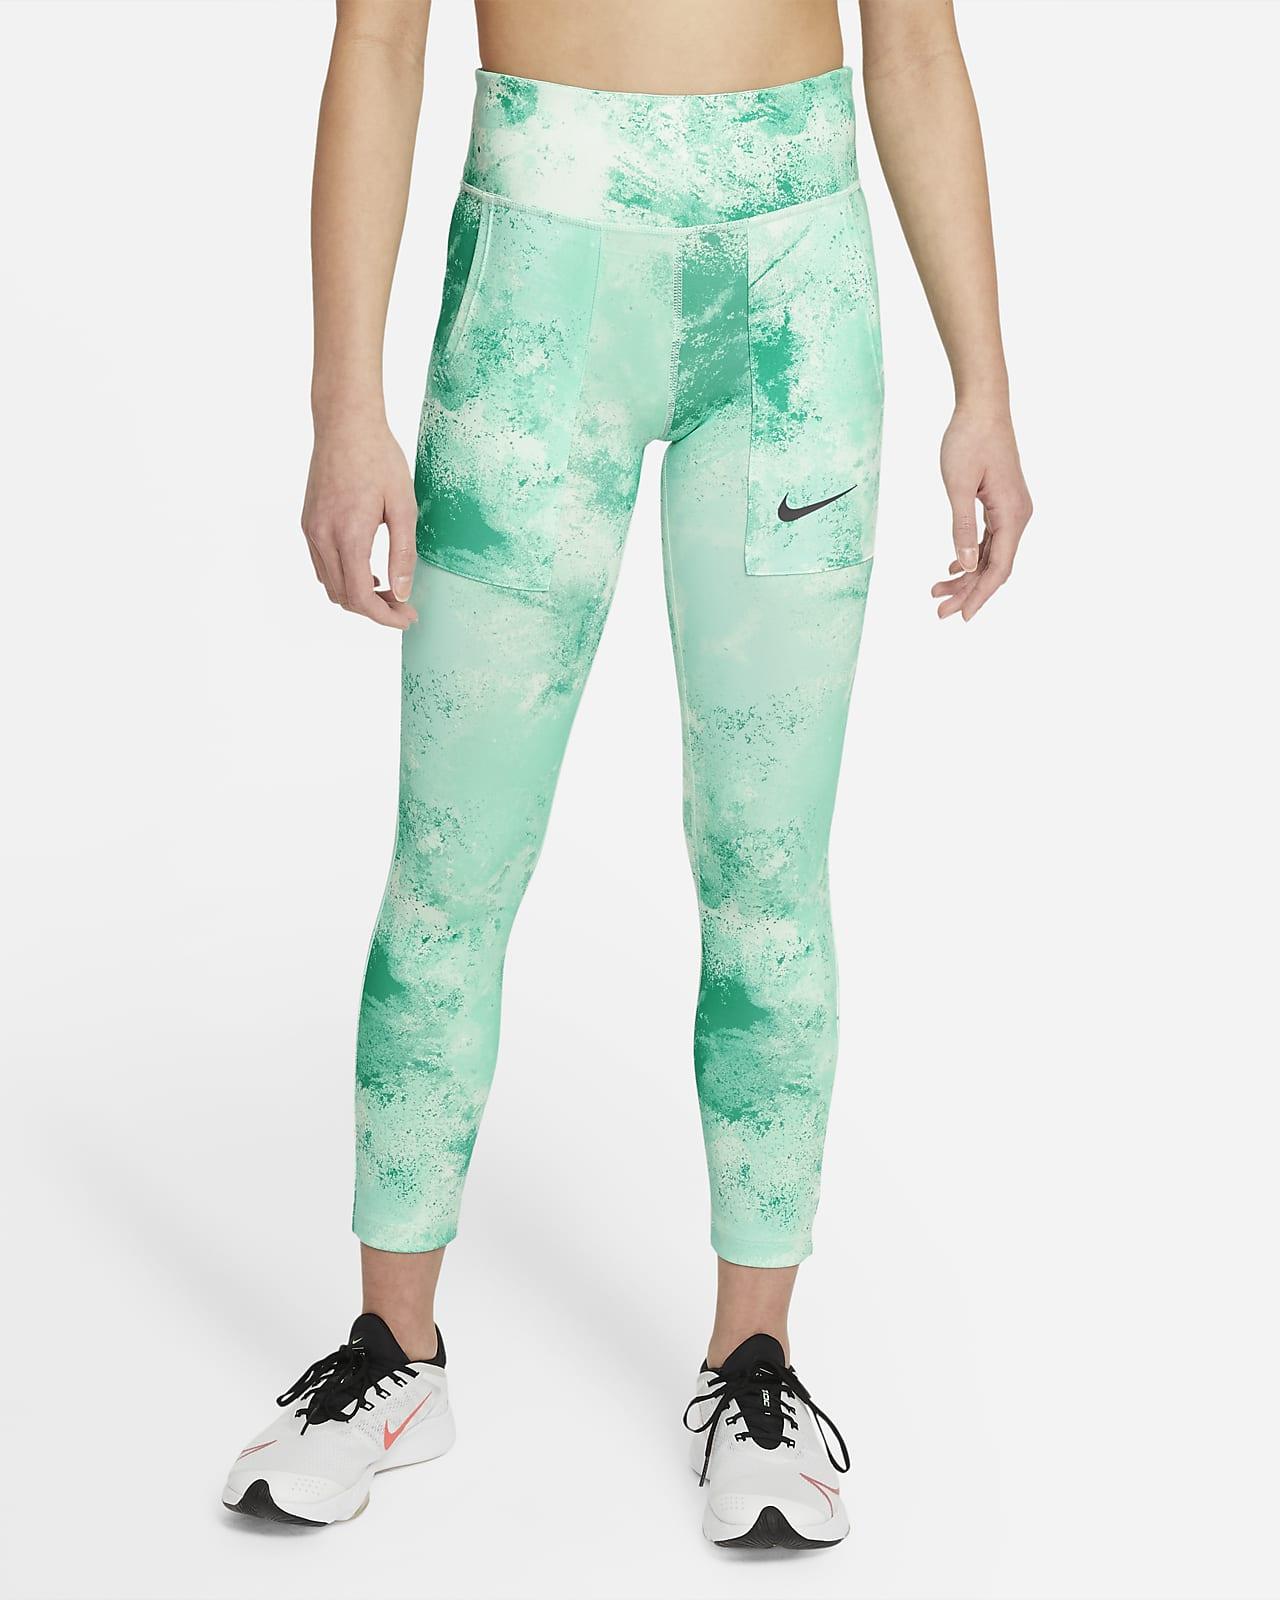 Nike One Leggings mit Batik-Print für ältere Kinder (Mädchen)